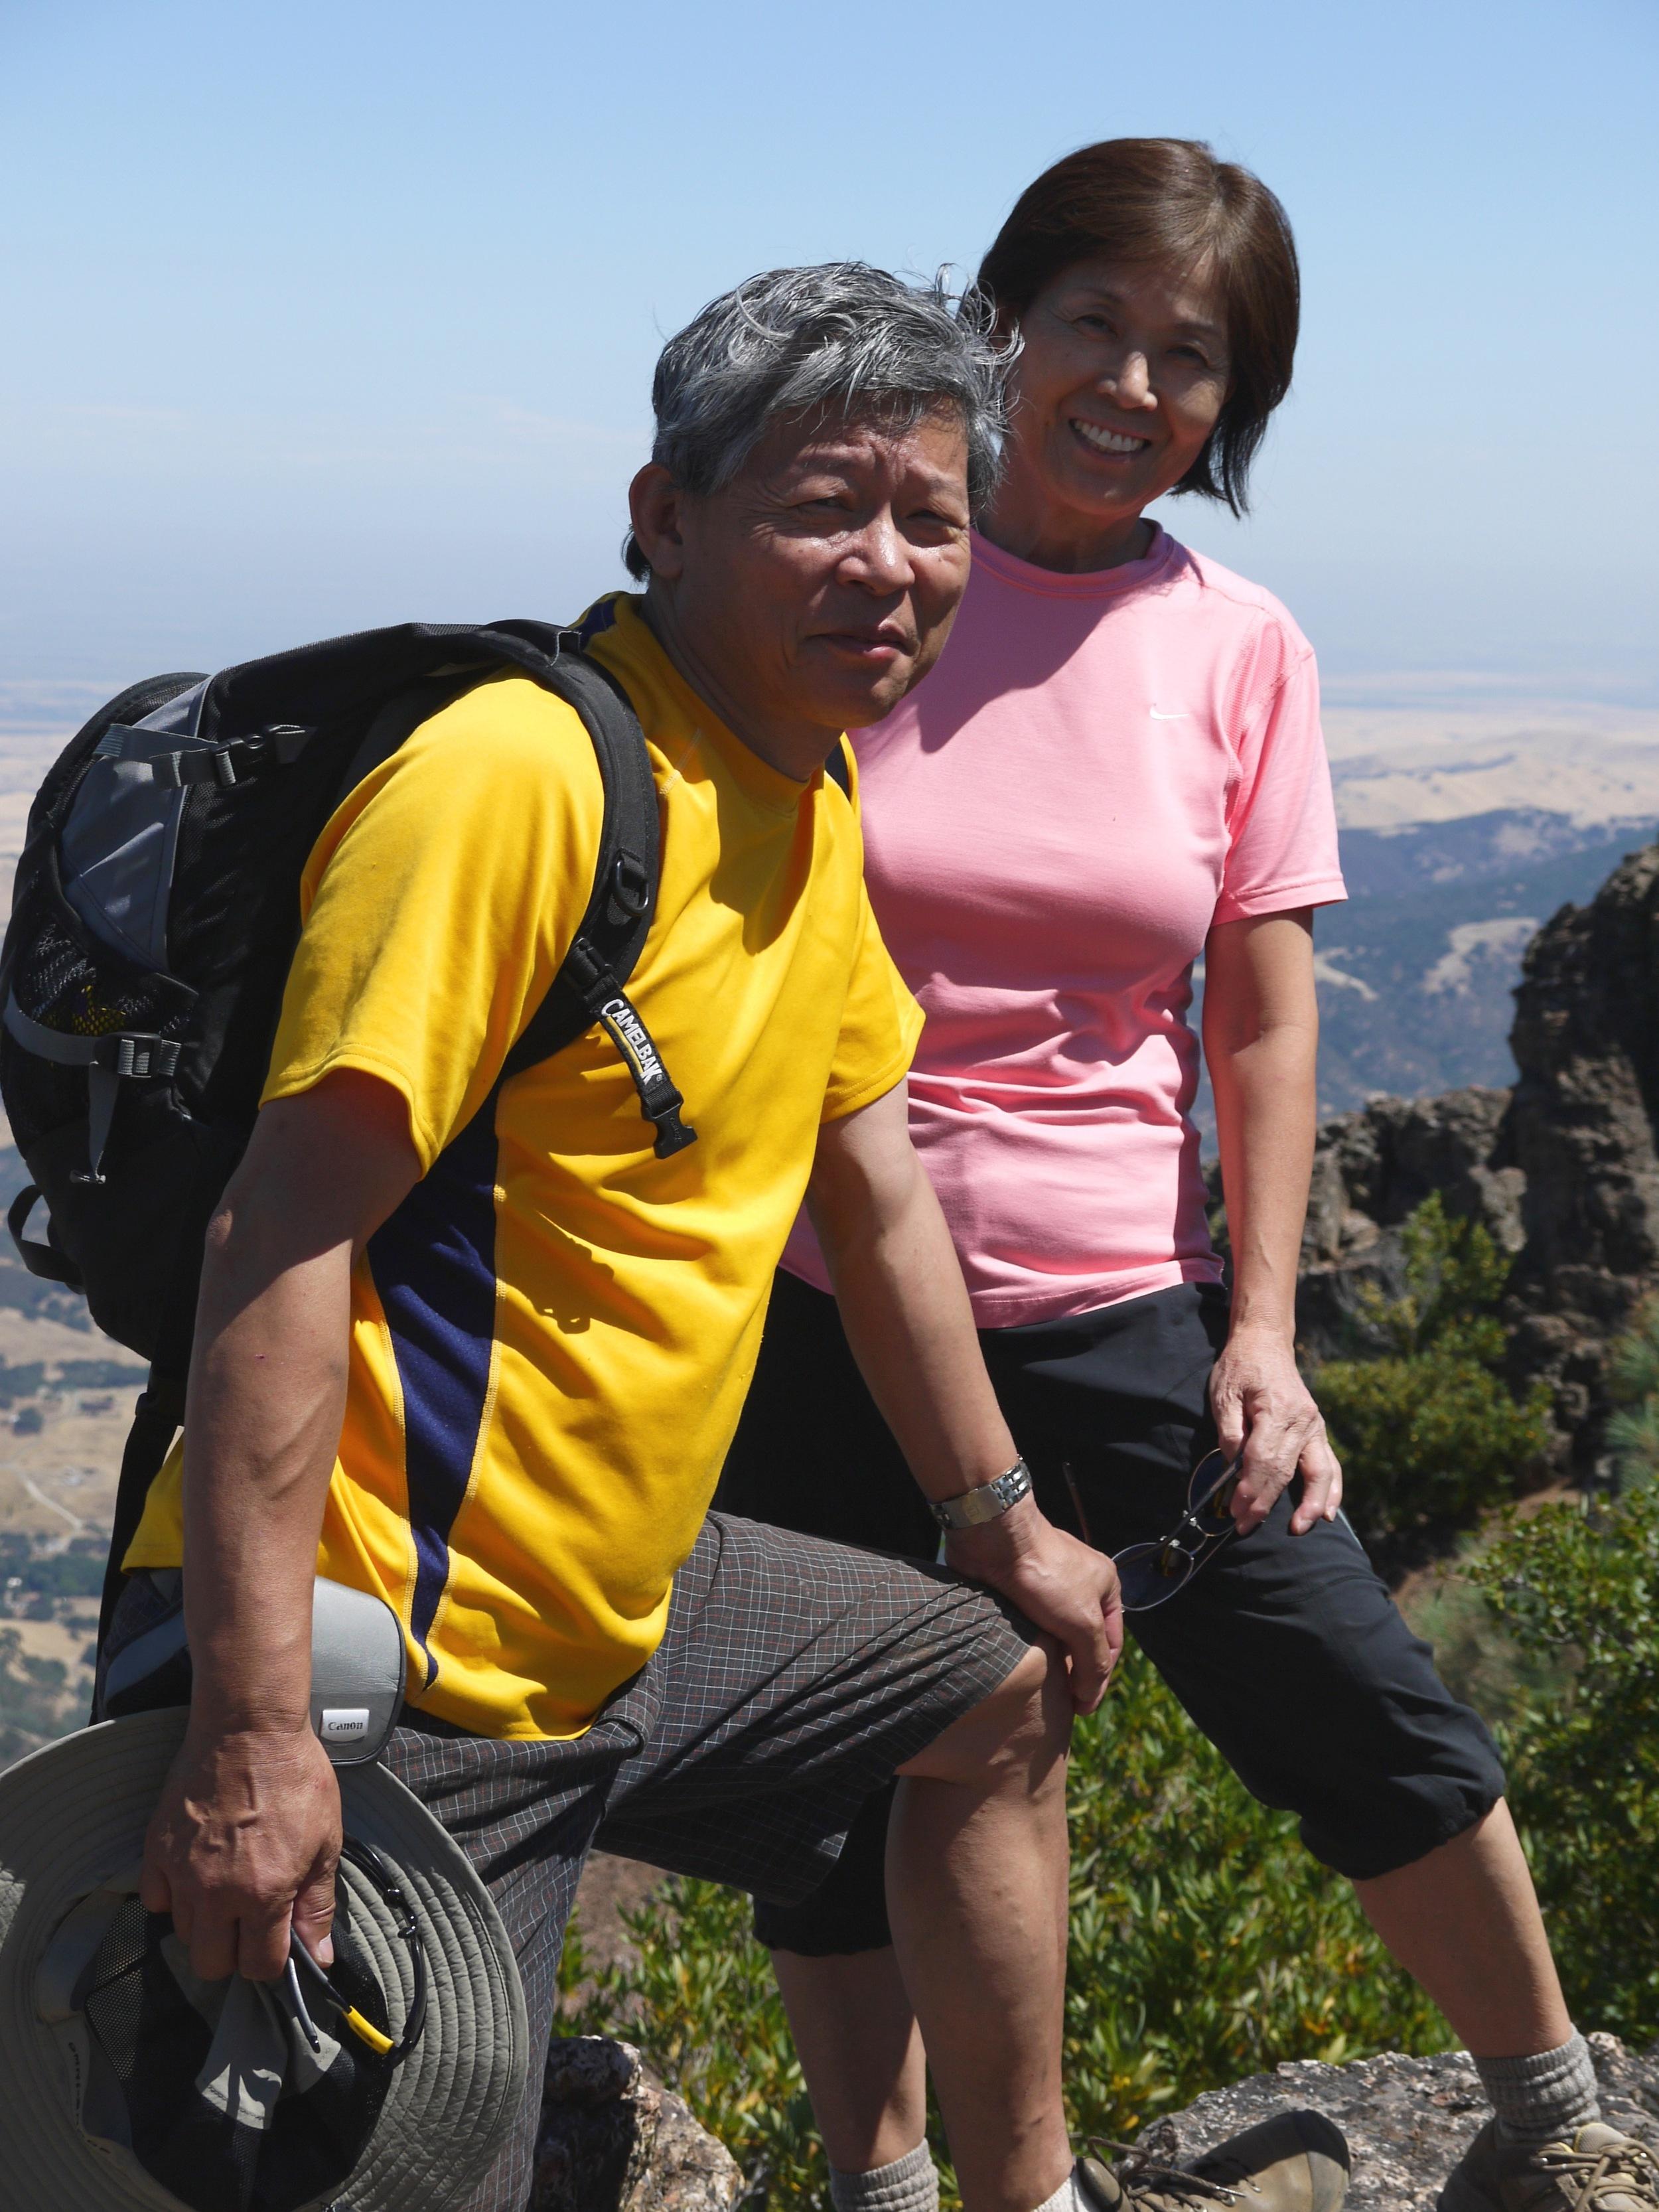 Masato and Yoko Suzuki grin and bear the trudge up North Peak Trail, Mt. Diablo.